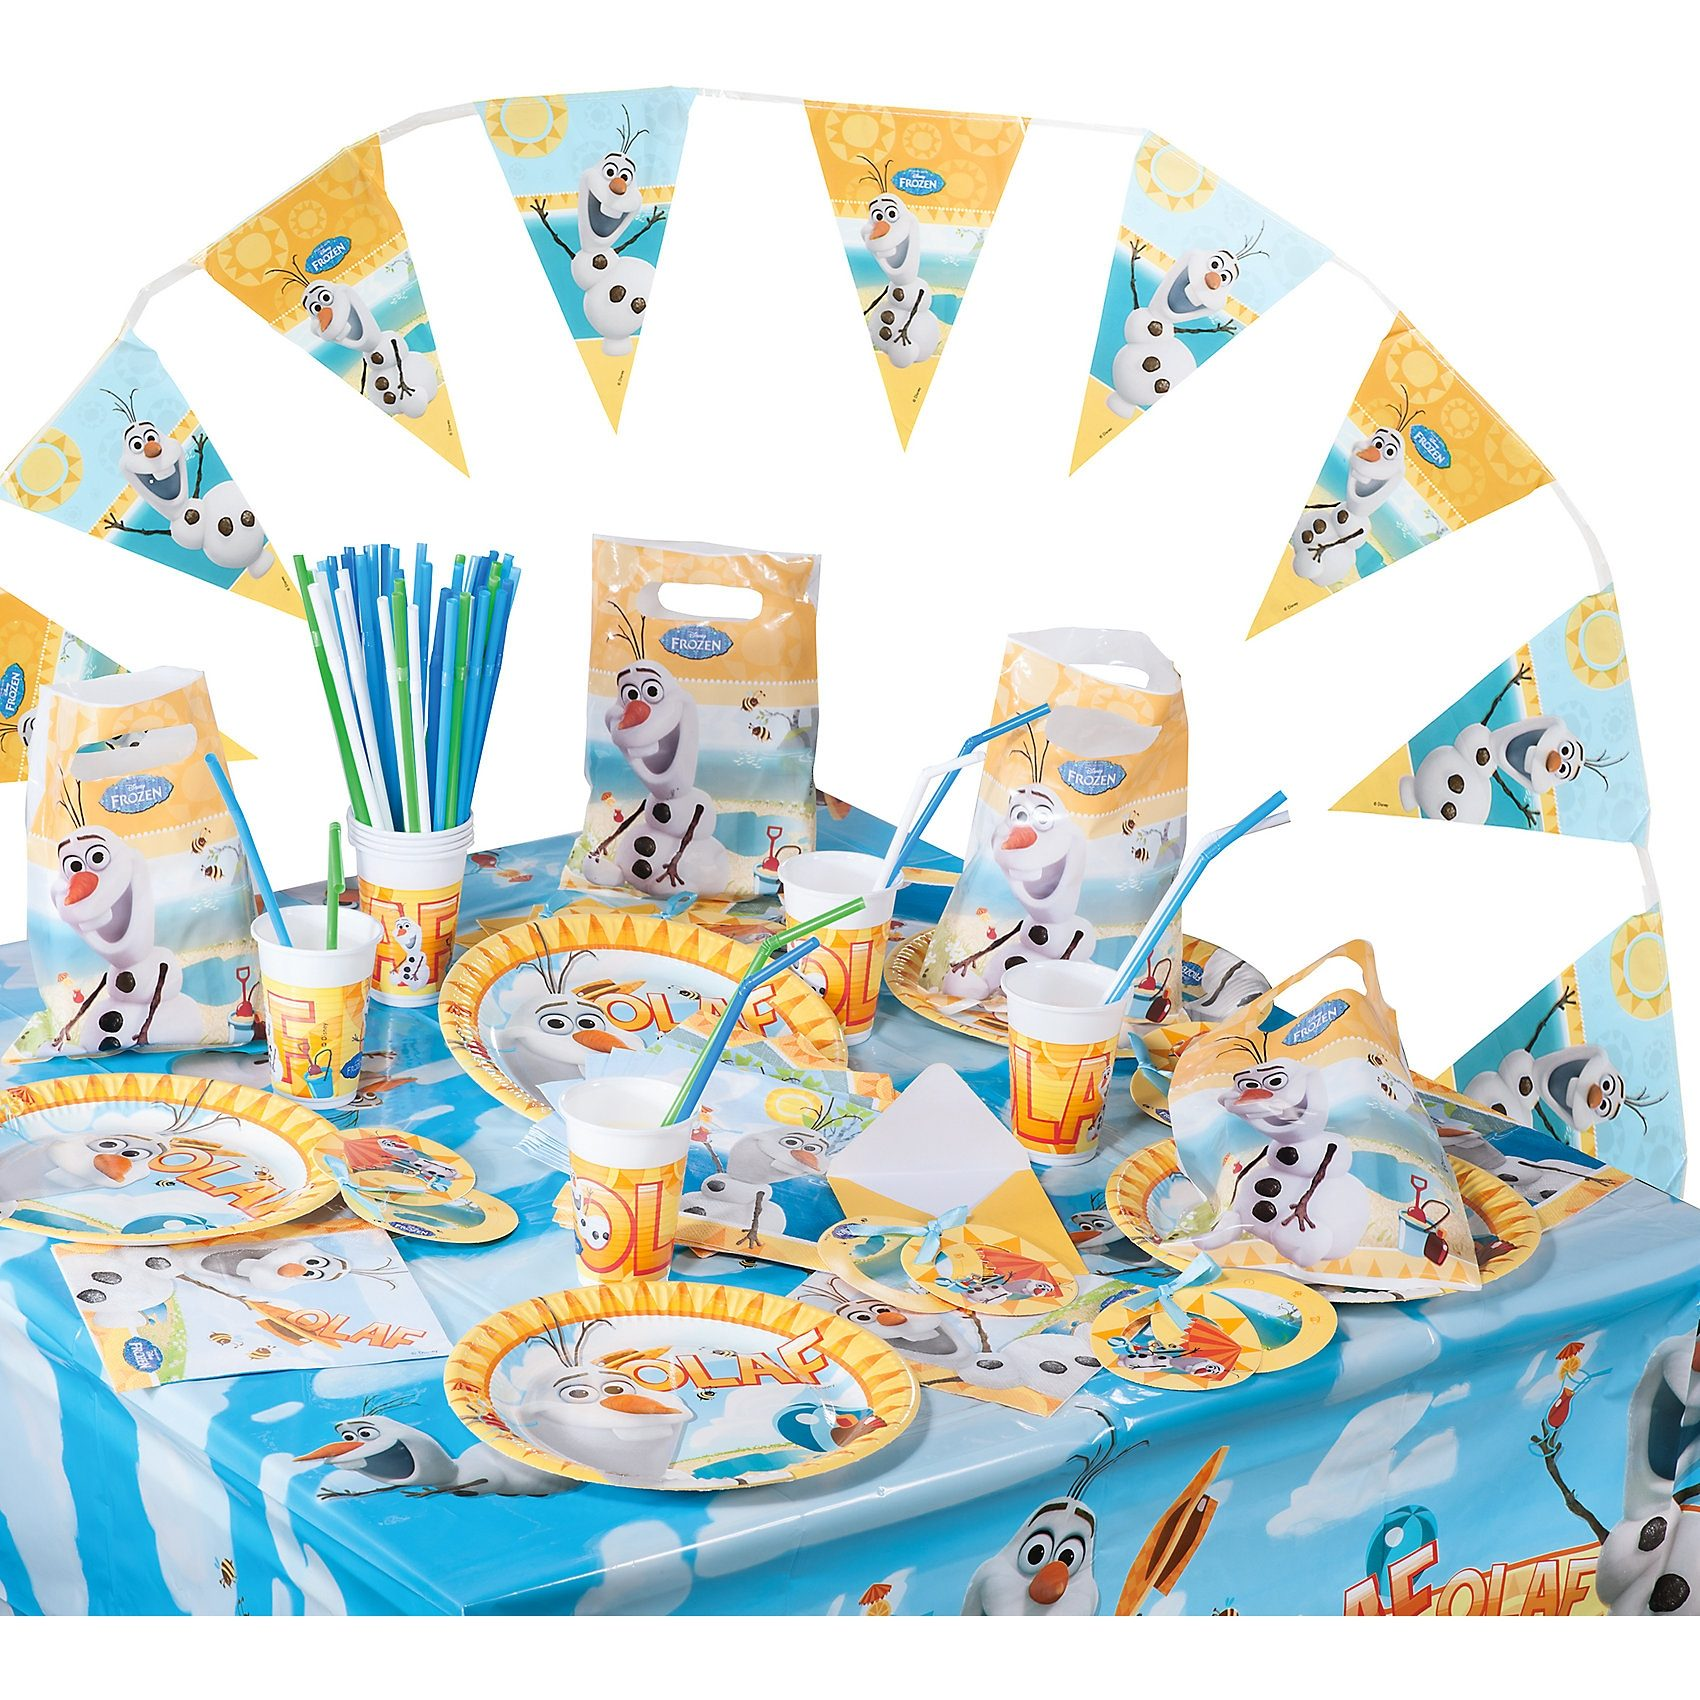 Procos Partyset Disney Die Eiskönigin Olaf, 100-tlg.